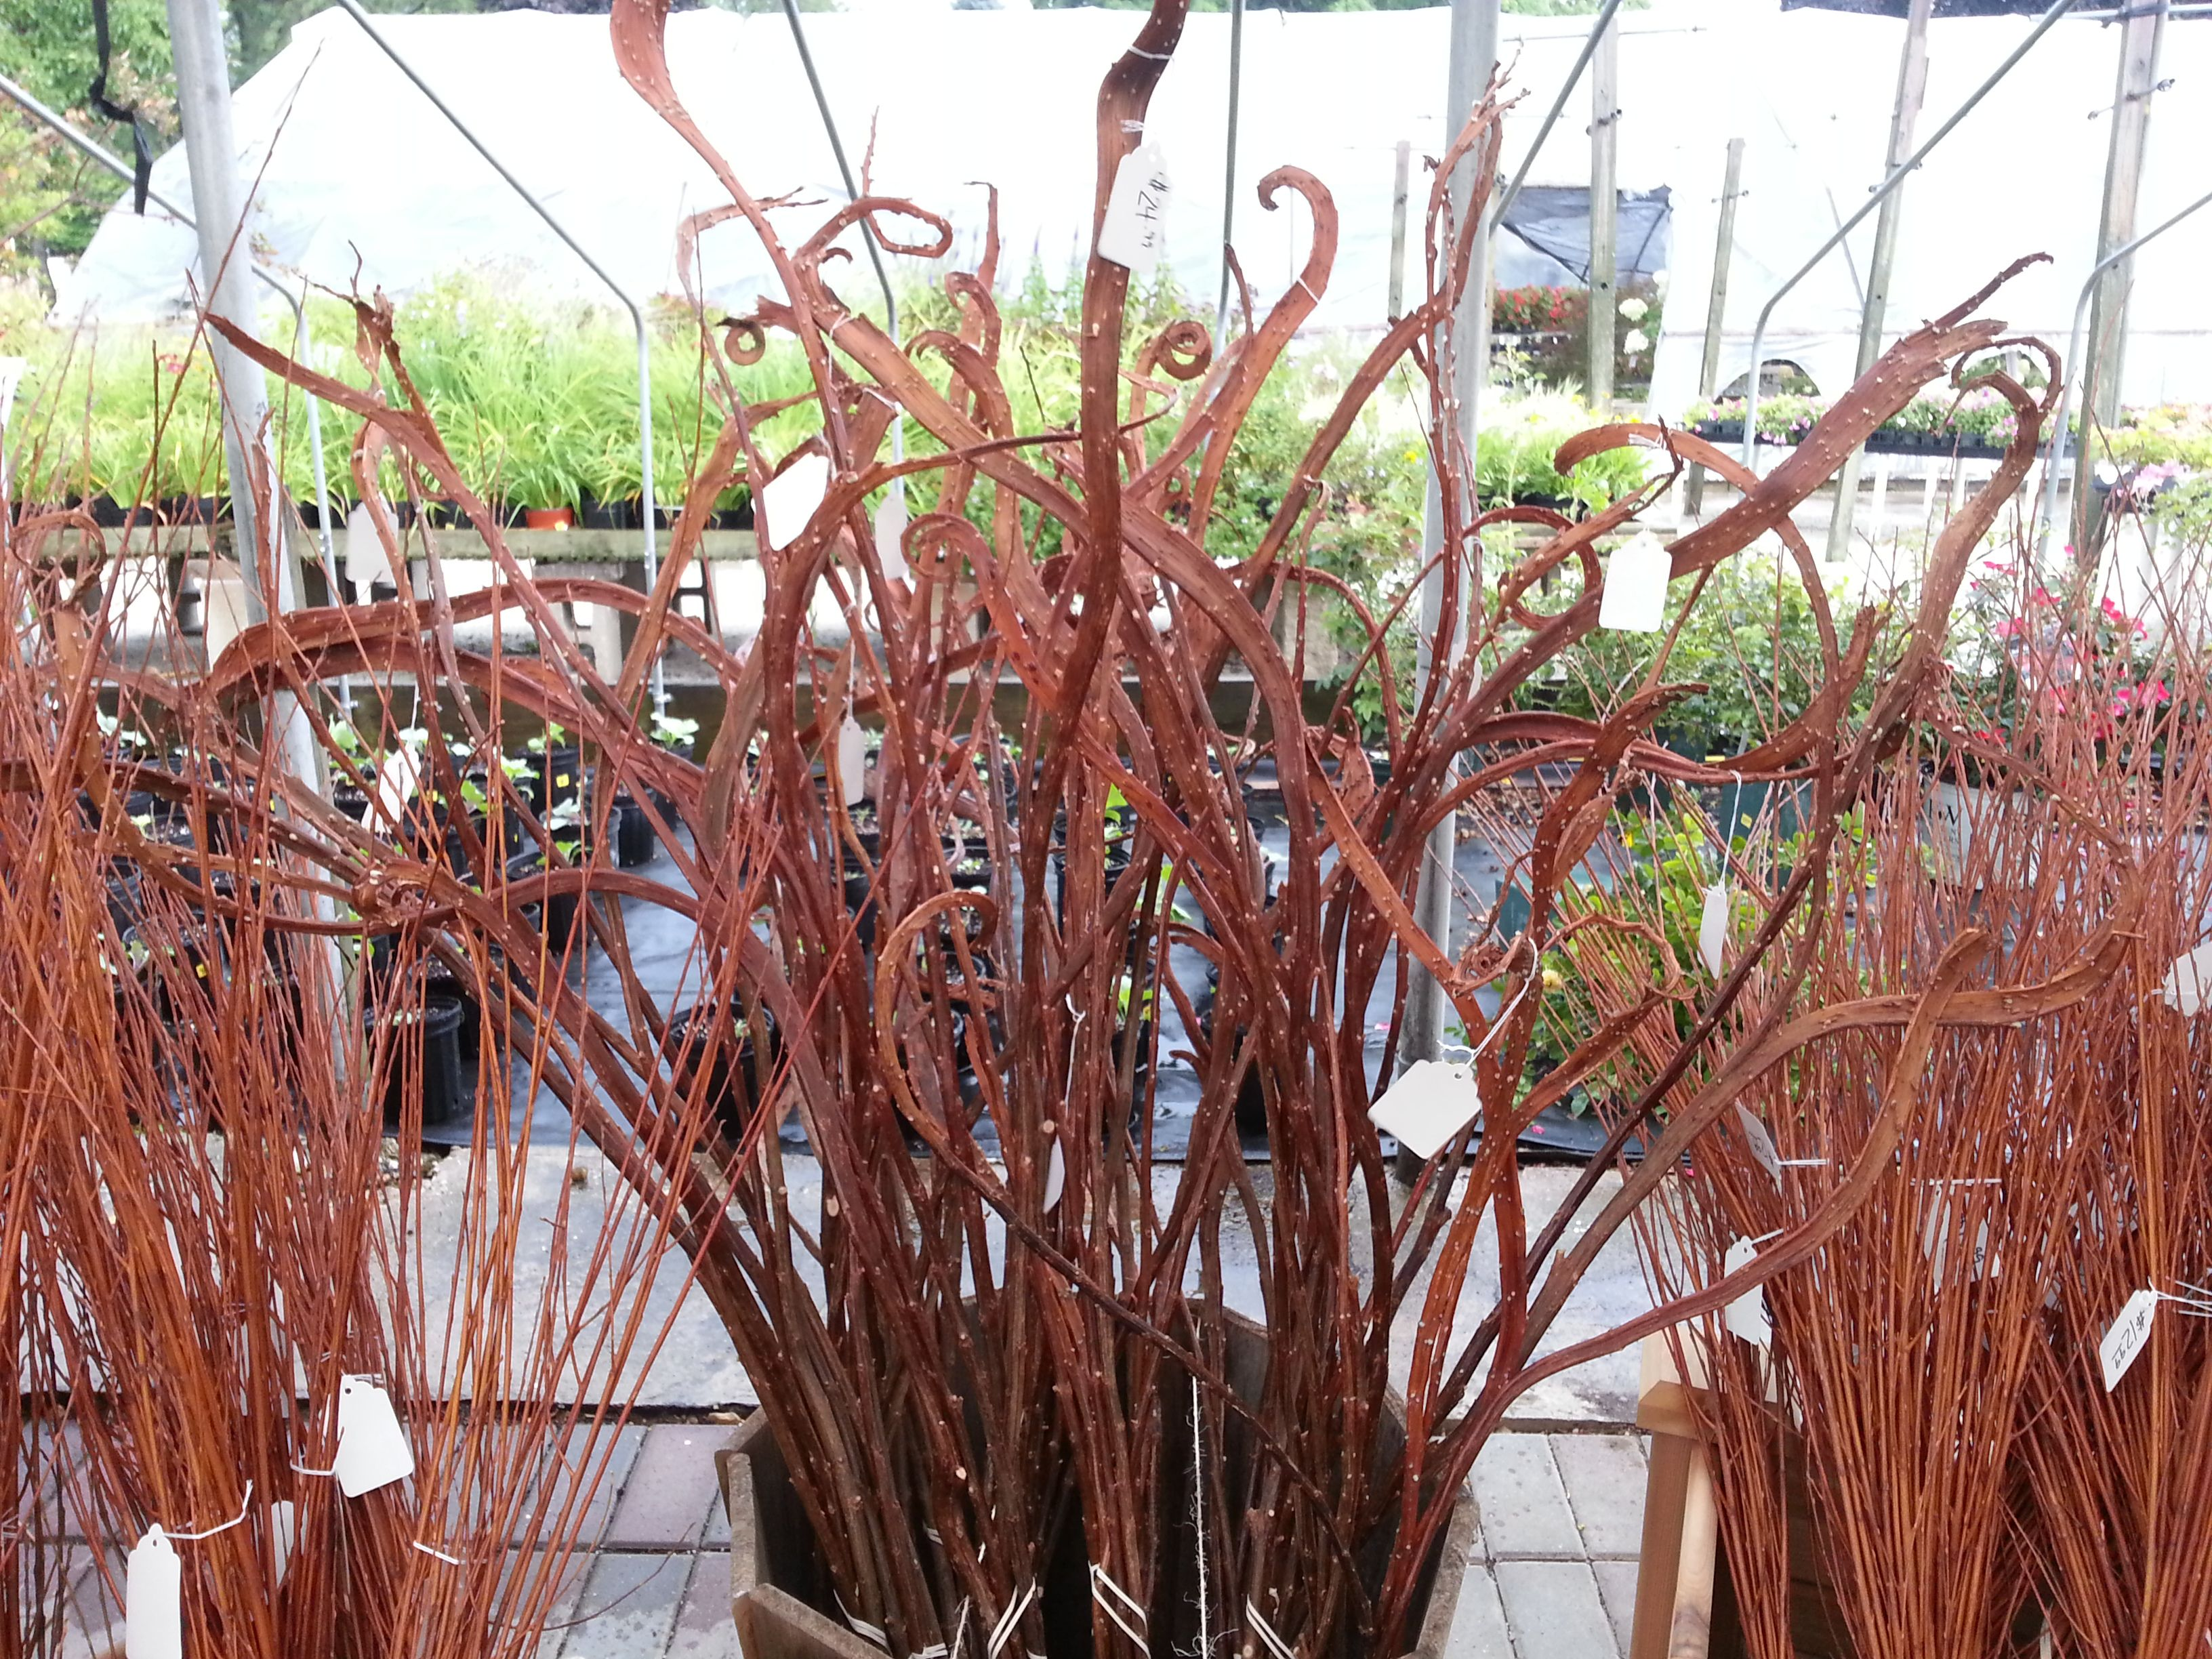 Japanese Fantail Willow Salix Sachalinensis Sekka Very Cool For Your Fall Pots Containers Www Westendflorist Com Fall Pots Salix Garden